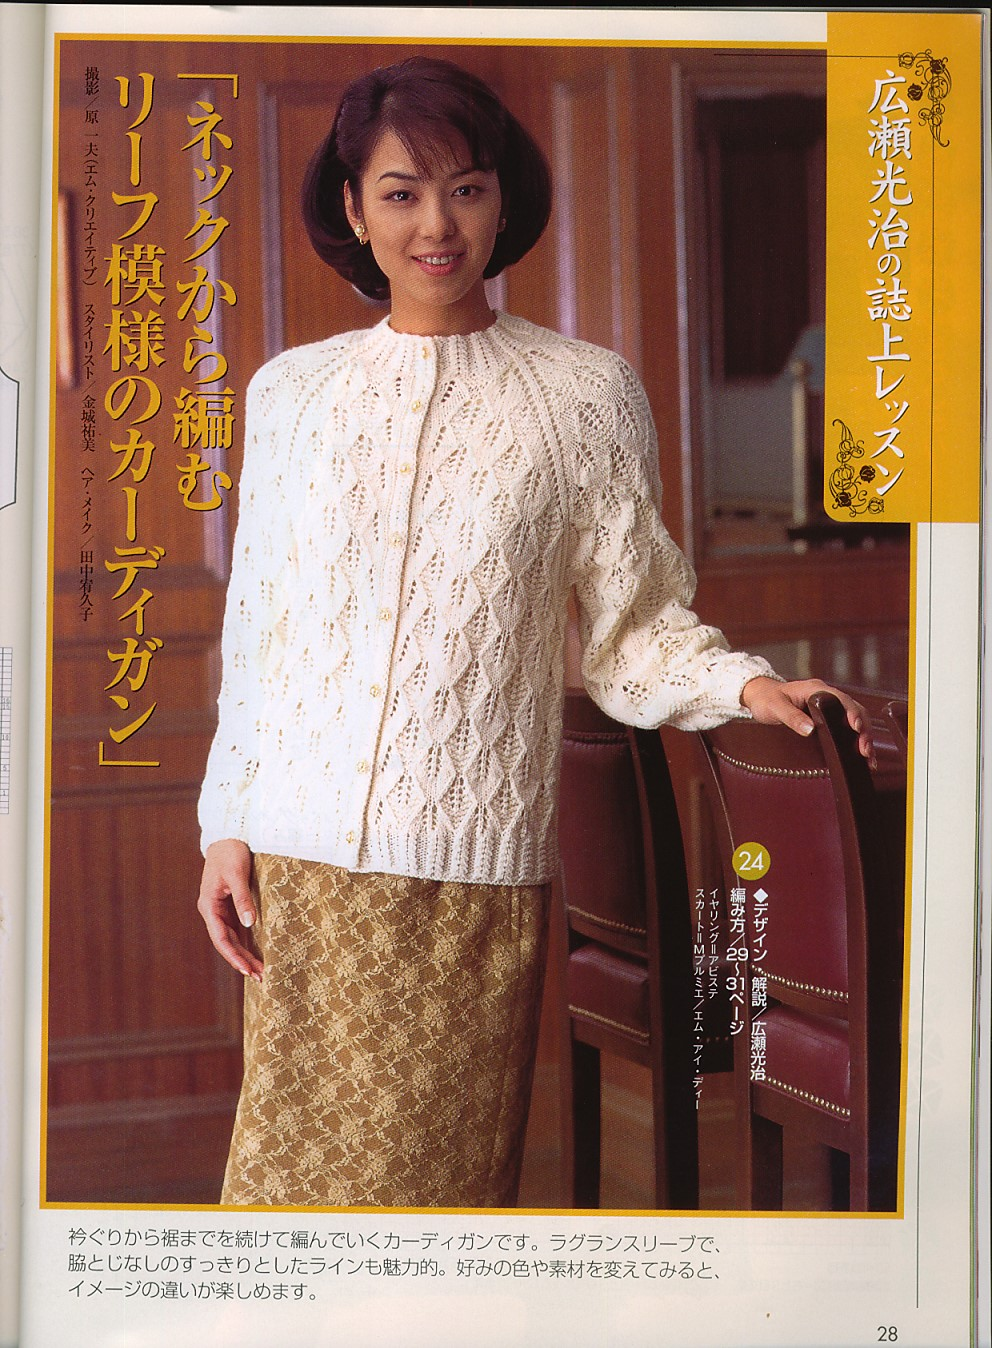 Вязание крючком и спицами/crochet and knitting: amu 1999 ear.